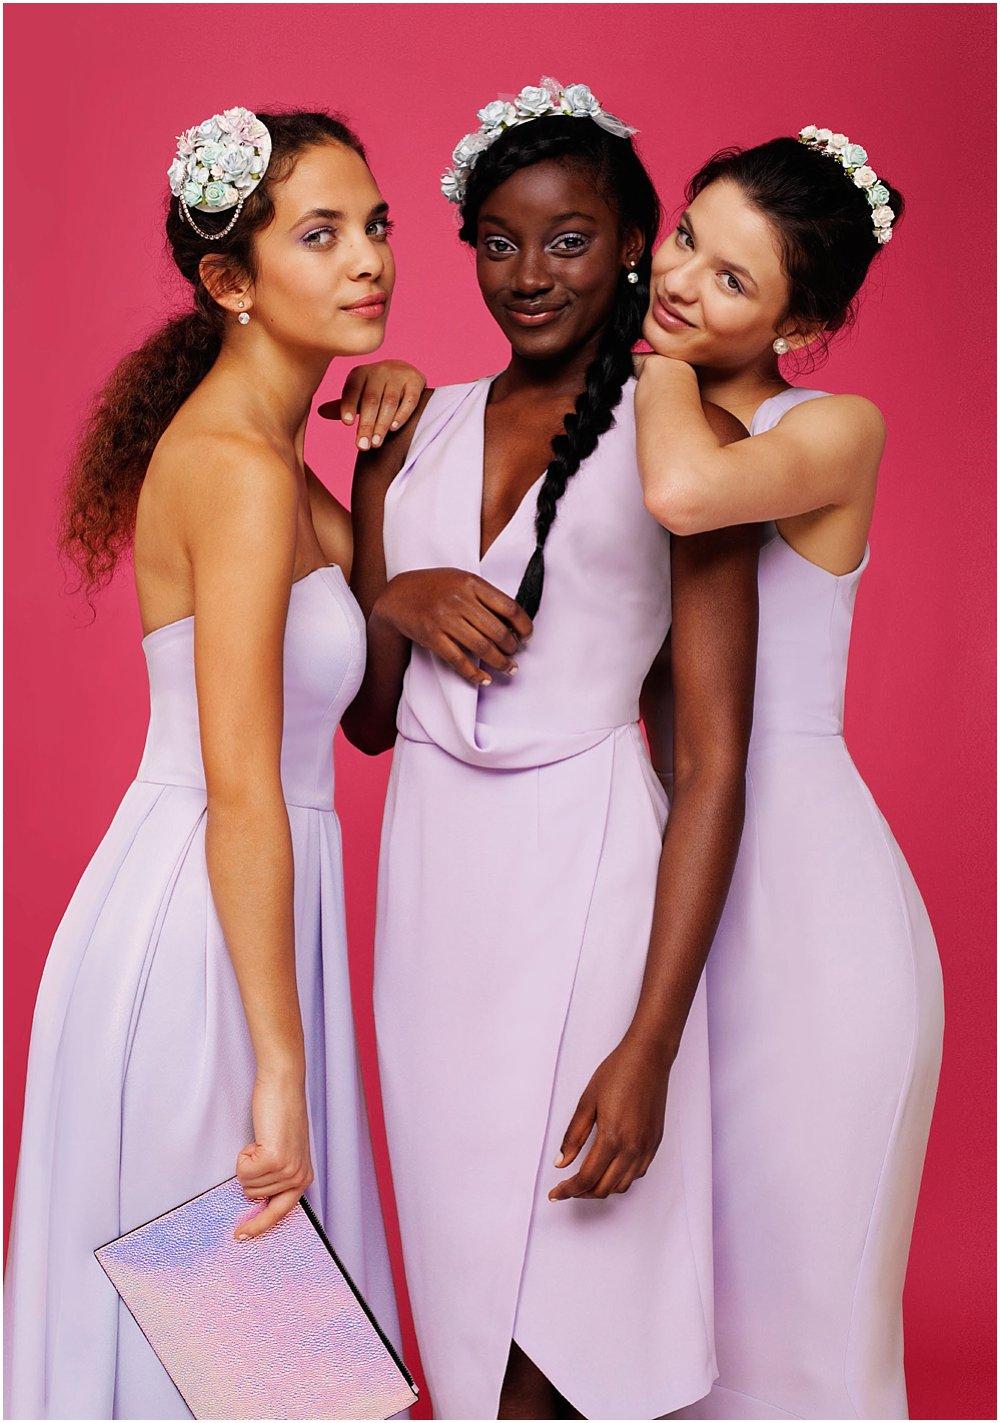 asos spring 2015 occasionwear_0382